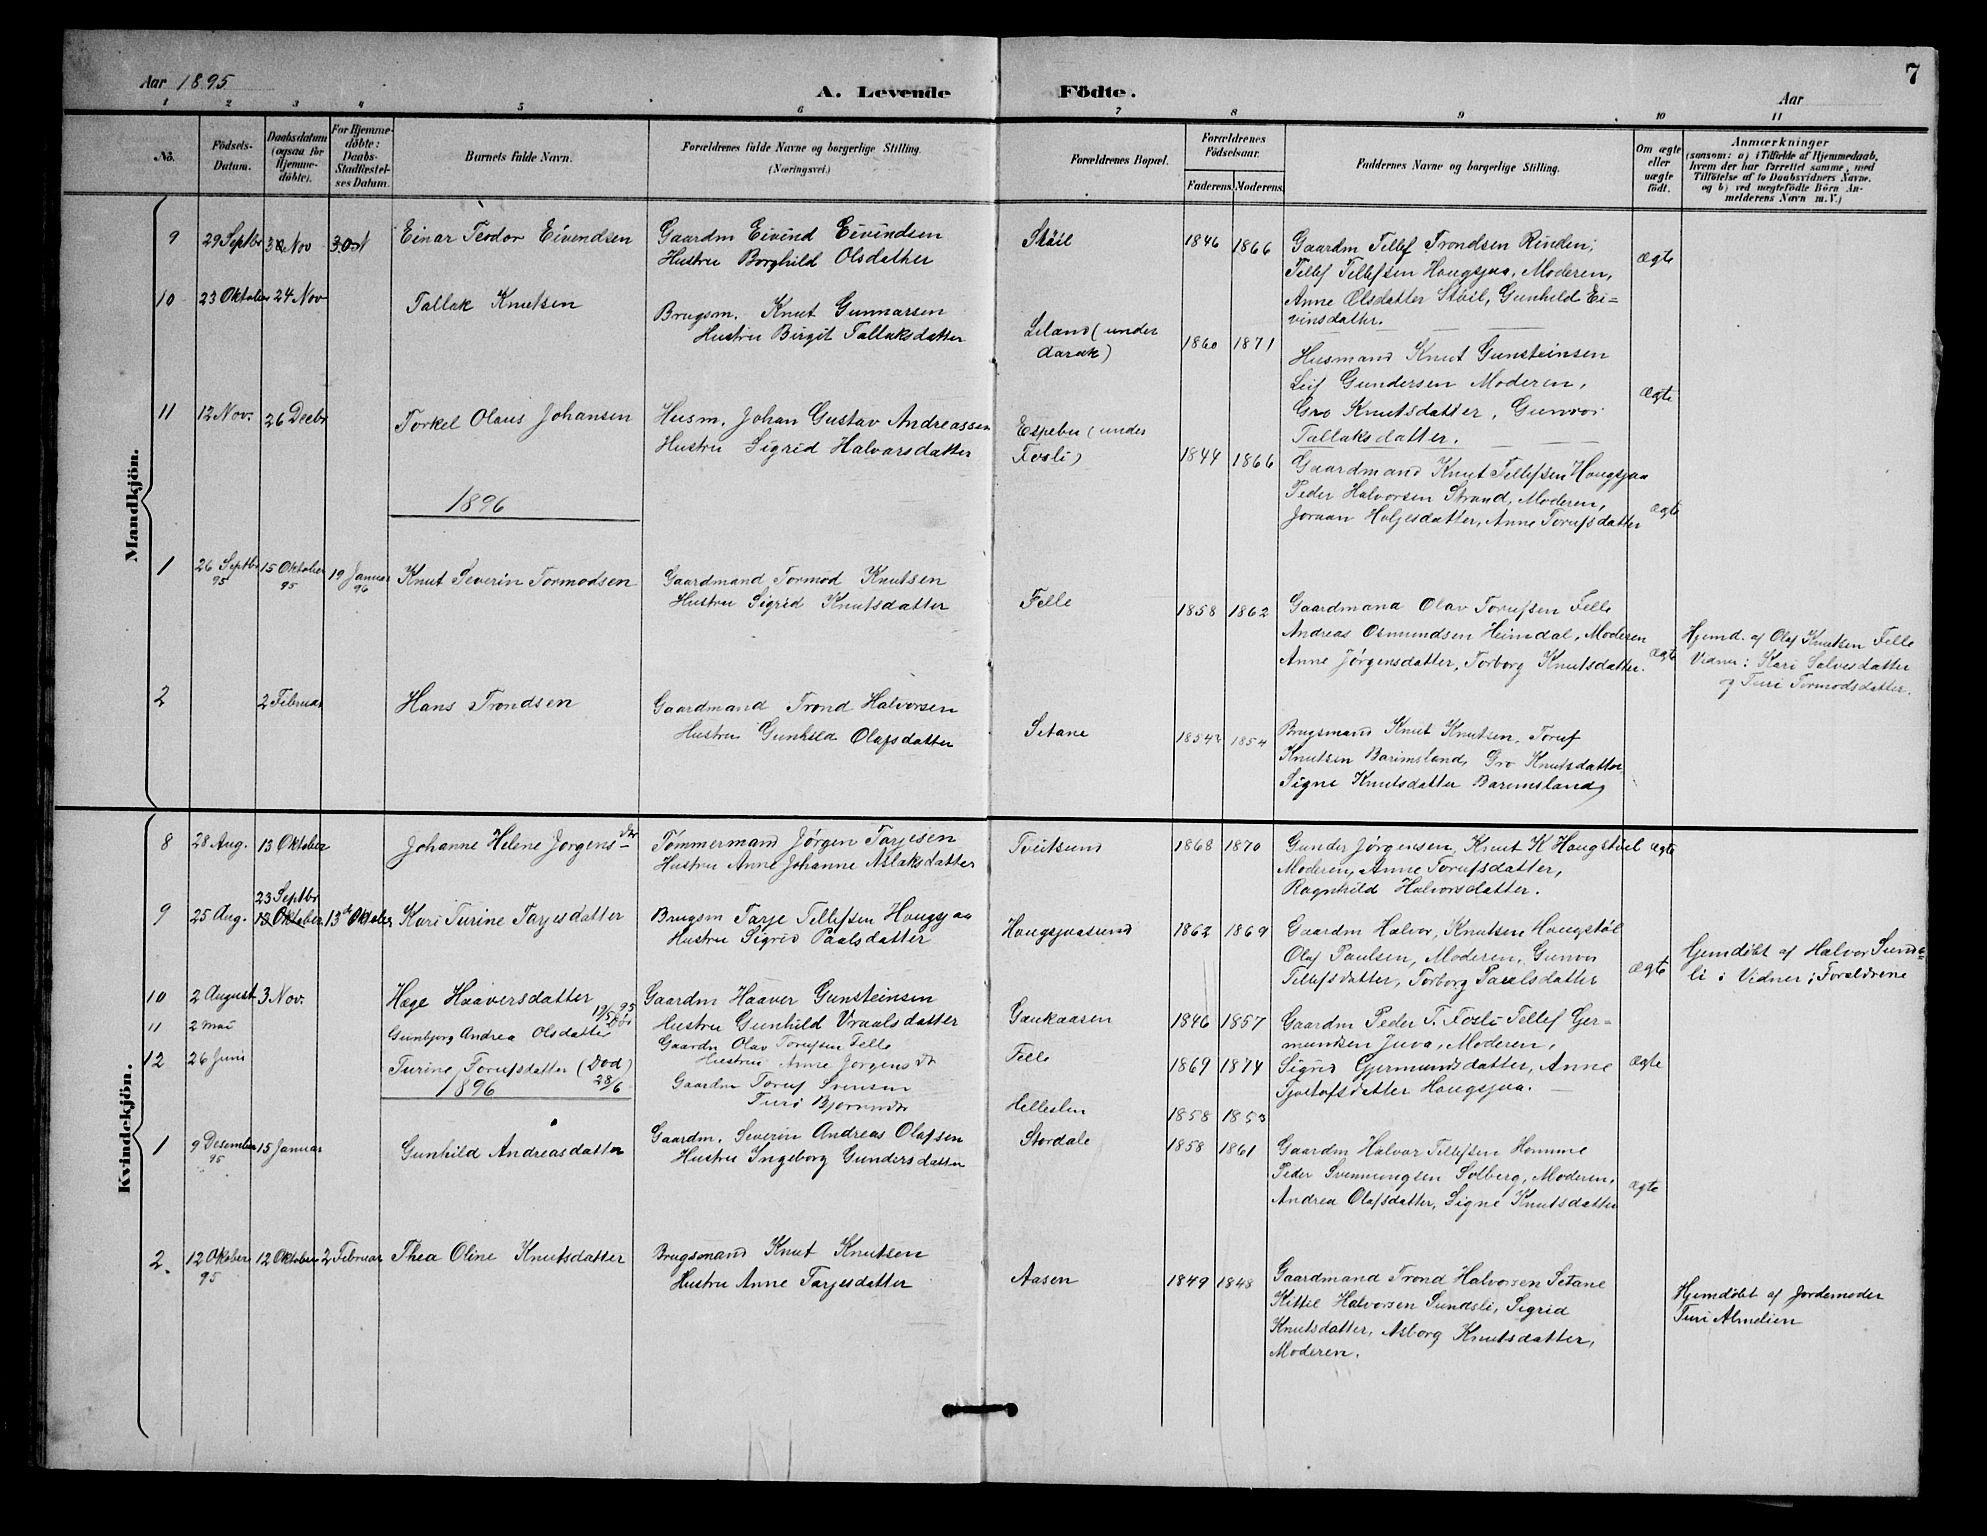 SAKO, Nissedal kirkebøker, G/Gb/L0003: Klokkerbok nr. II 3, 1893-1928, s. 7